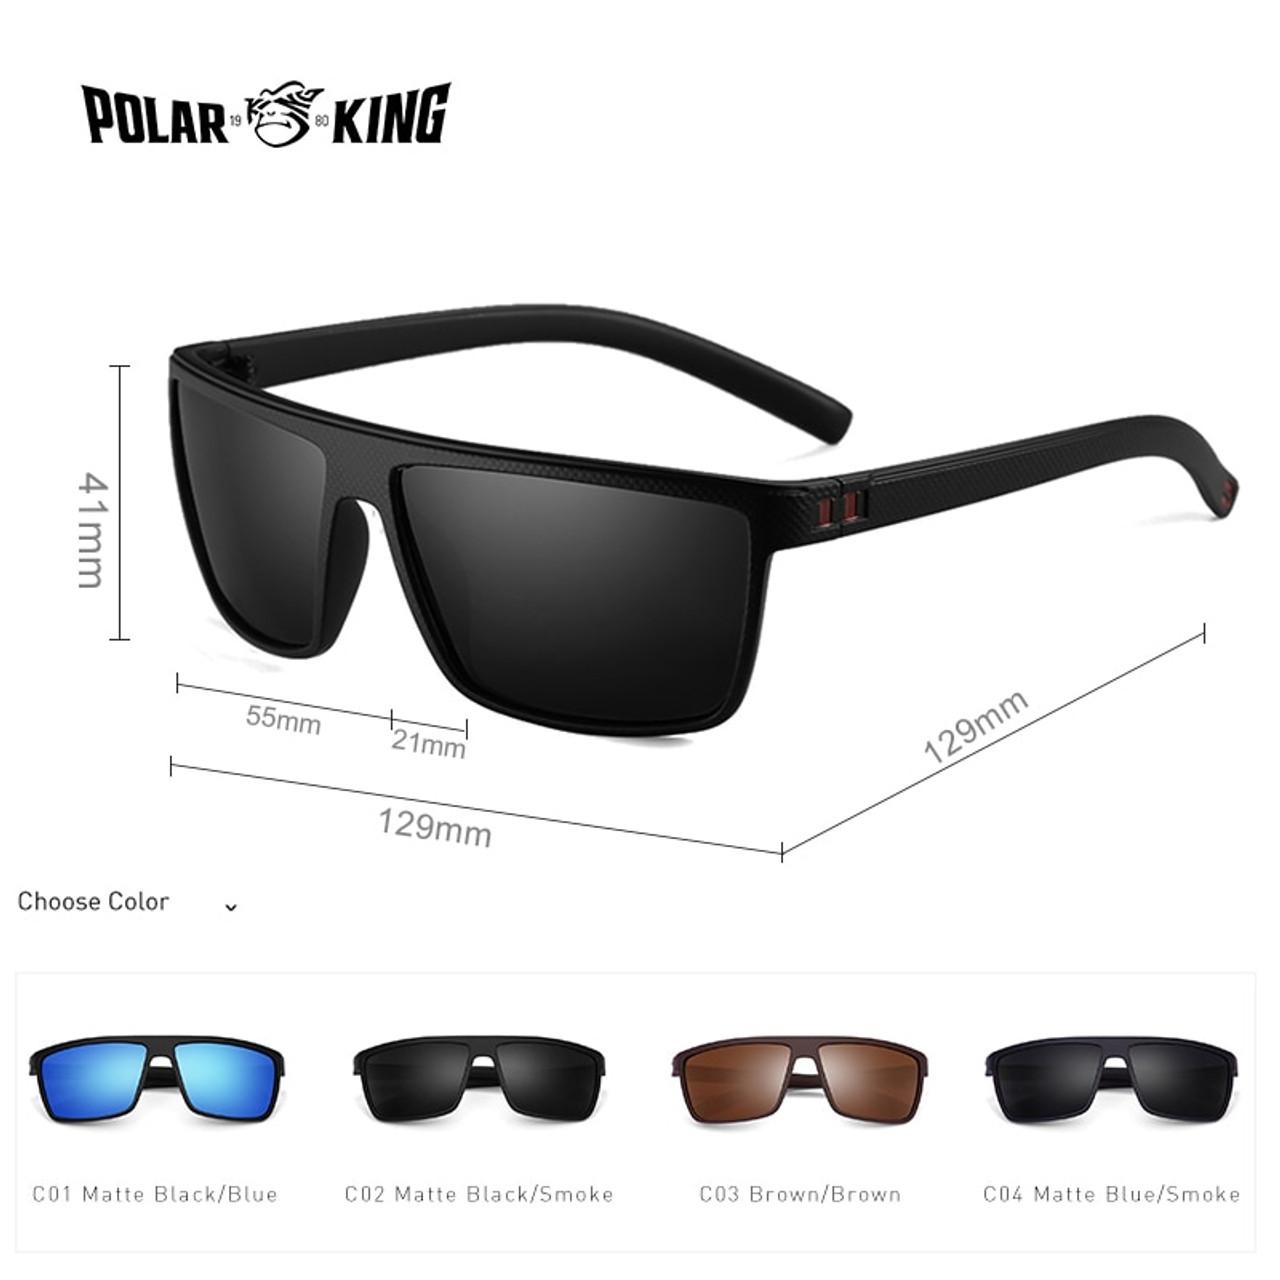 524e240f12376 ... POLARKING Brand Retro Polarized Sunglasses For Men Oculos de sol Men s  Fashion Square Driving Eyewear Traveling ...